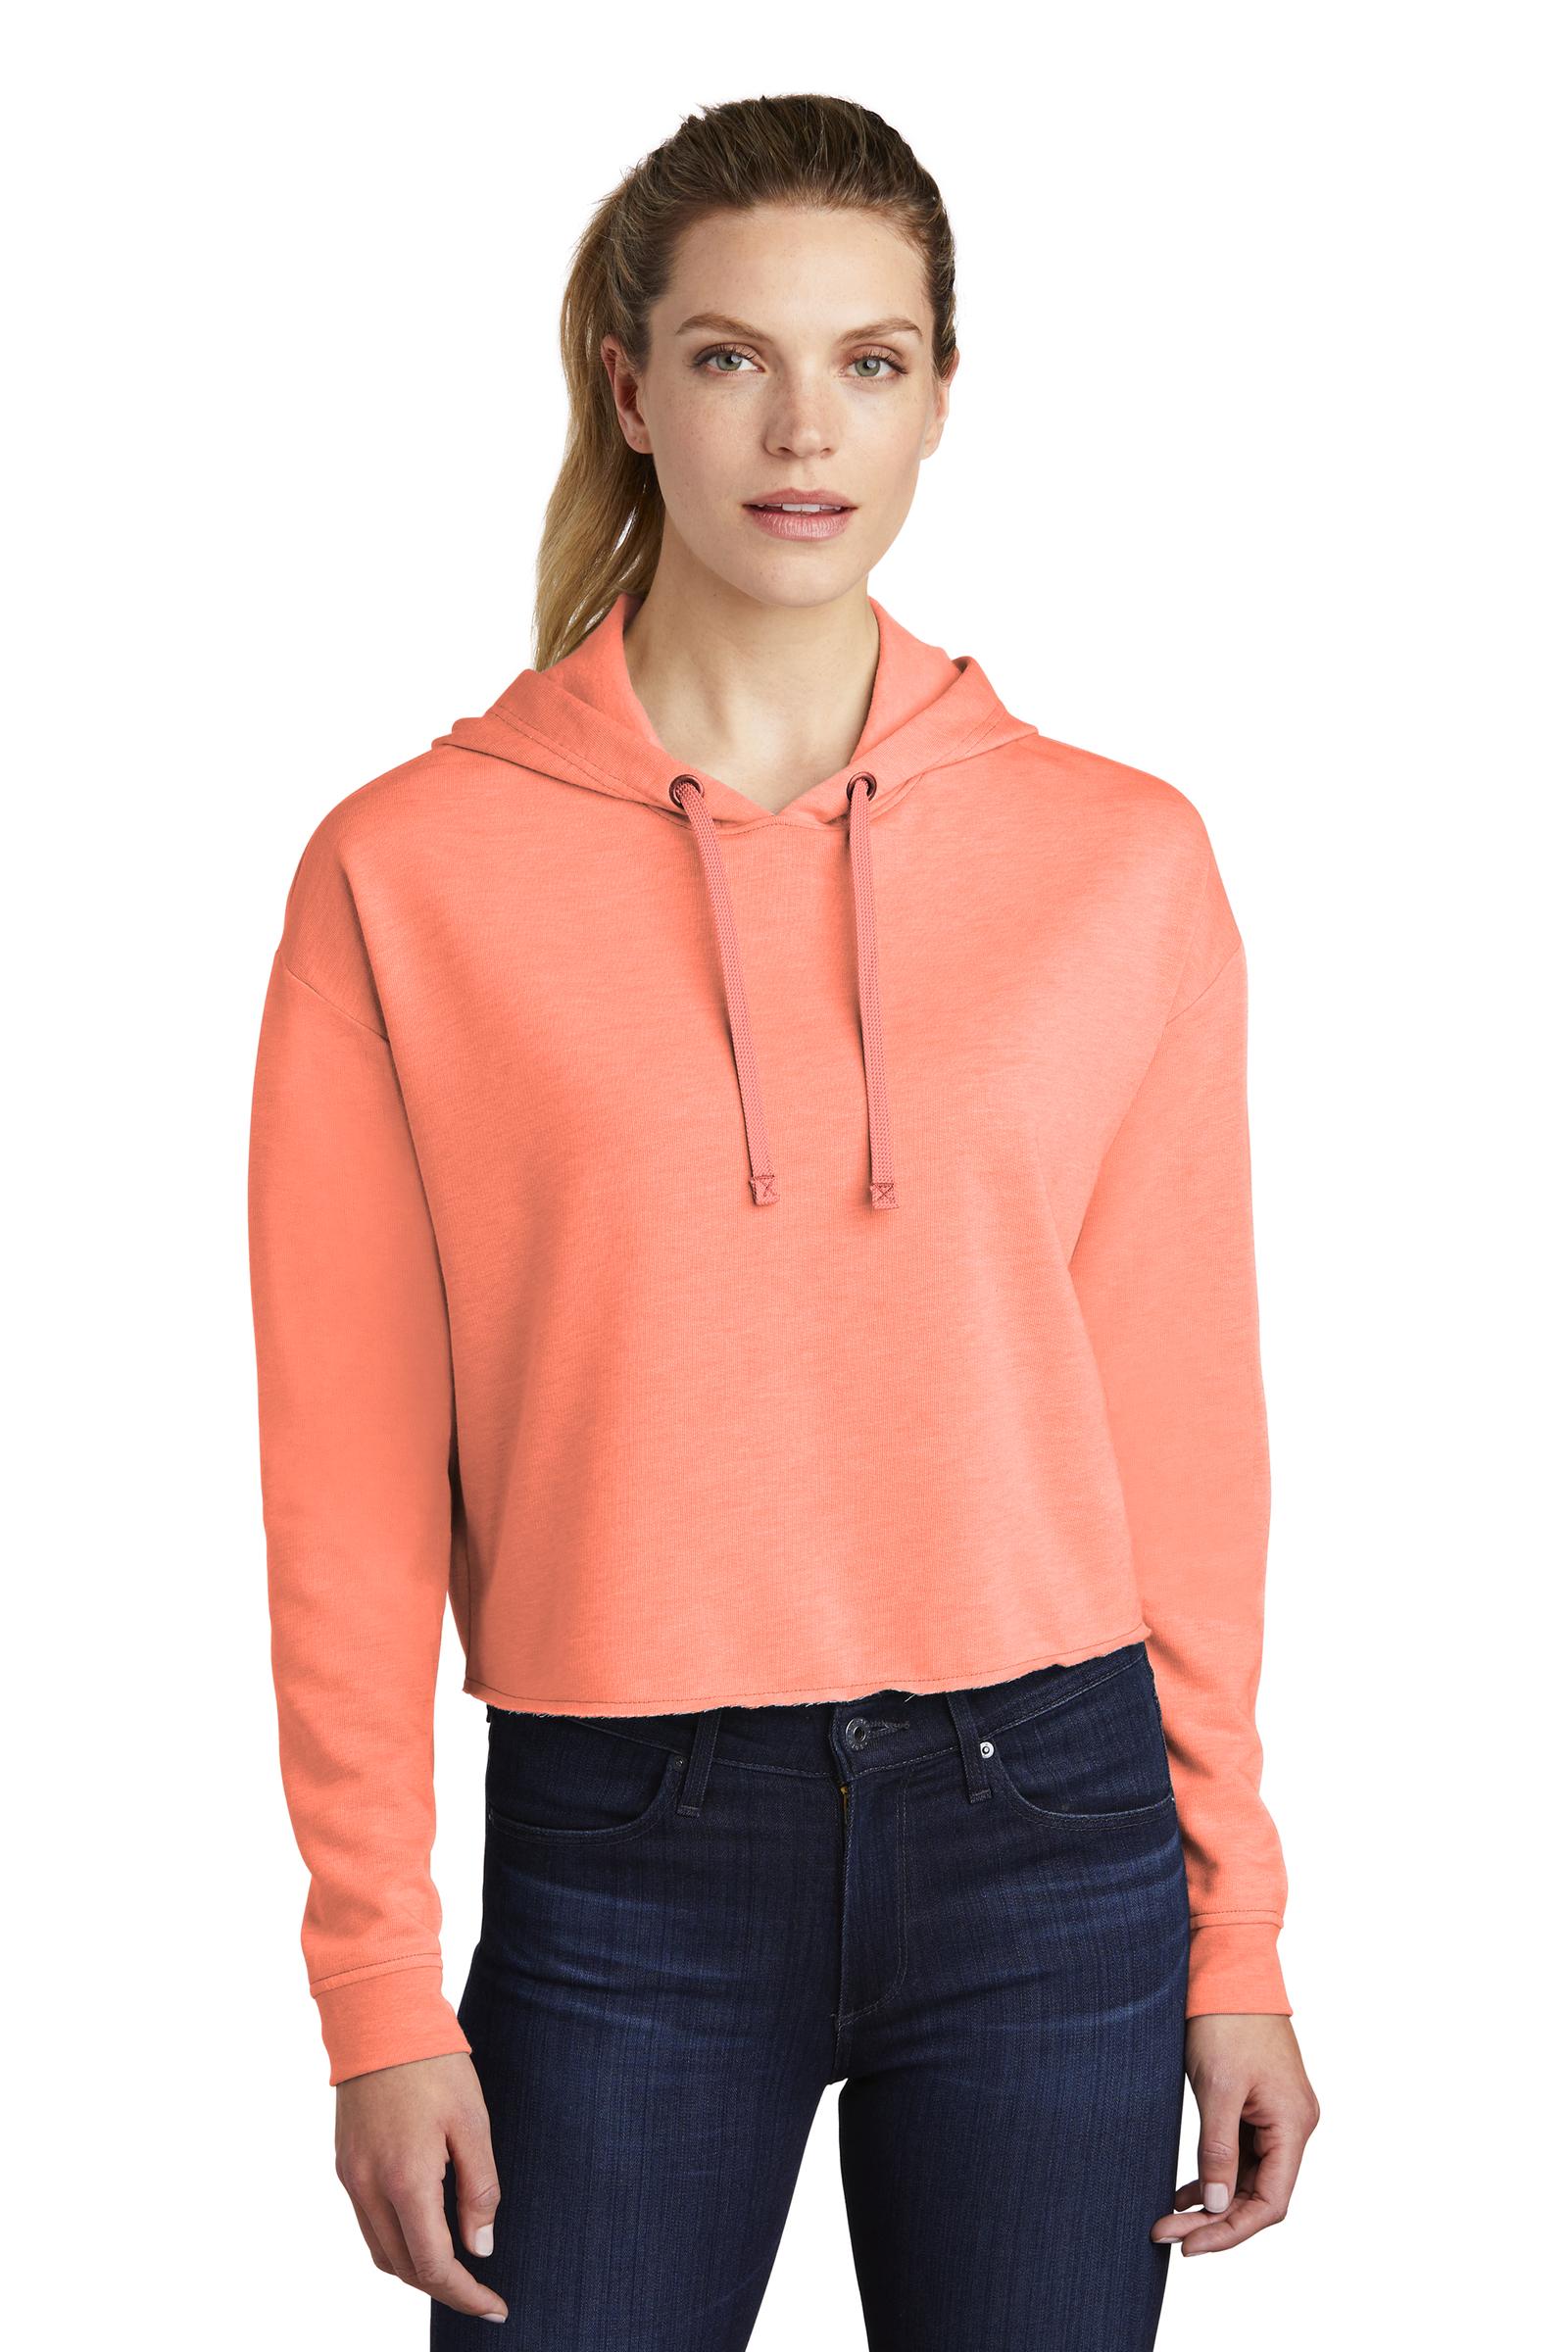 Sport-Tek Embroidered Women's Tri-Blend Wicking Fleece Crop Hoodie